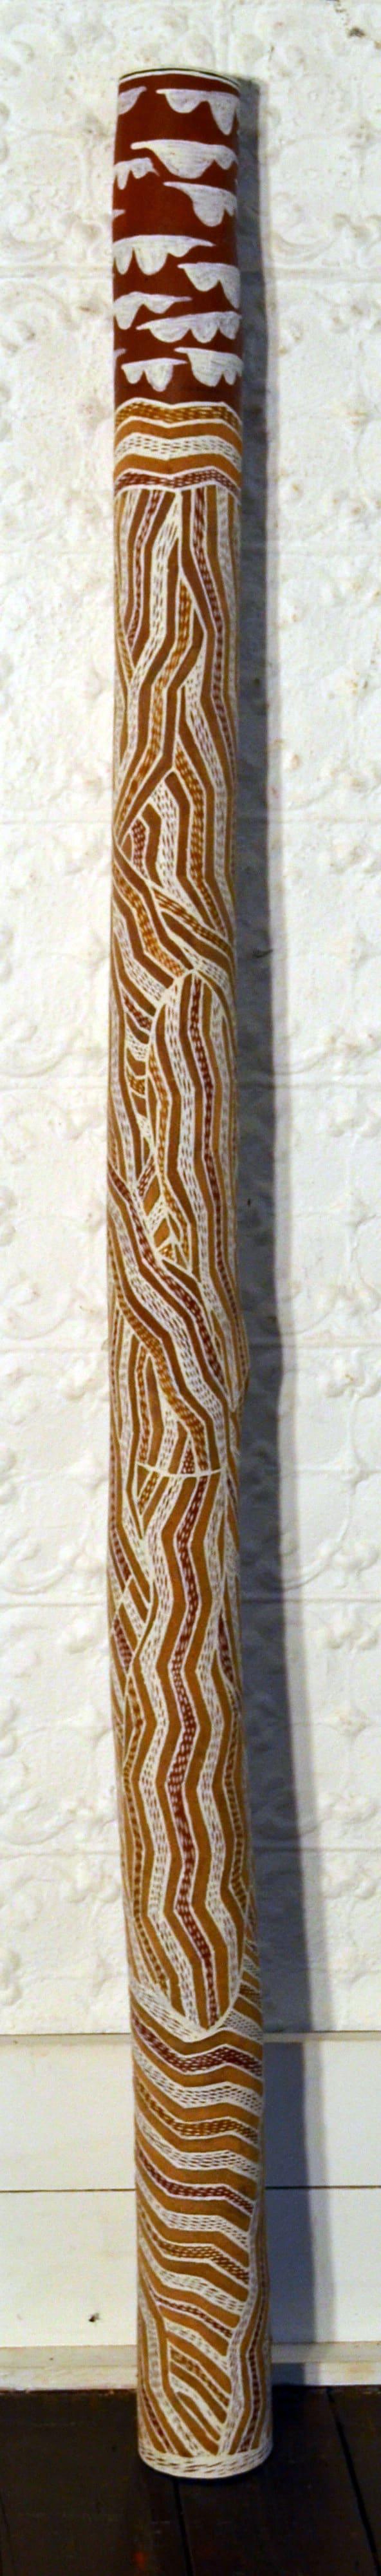 Lamangirra #2 Gumana Garraparra Larrakitj Ochre on wood 178 x 10 x 10 cm